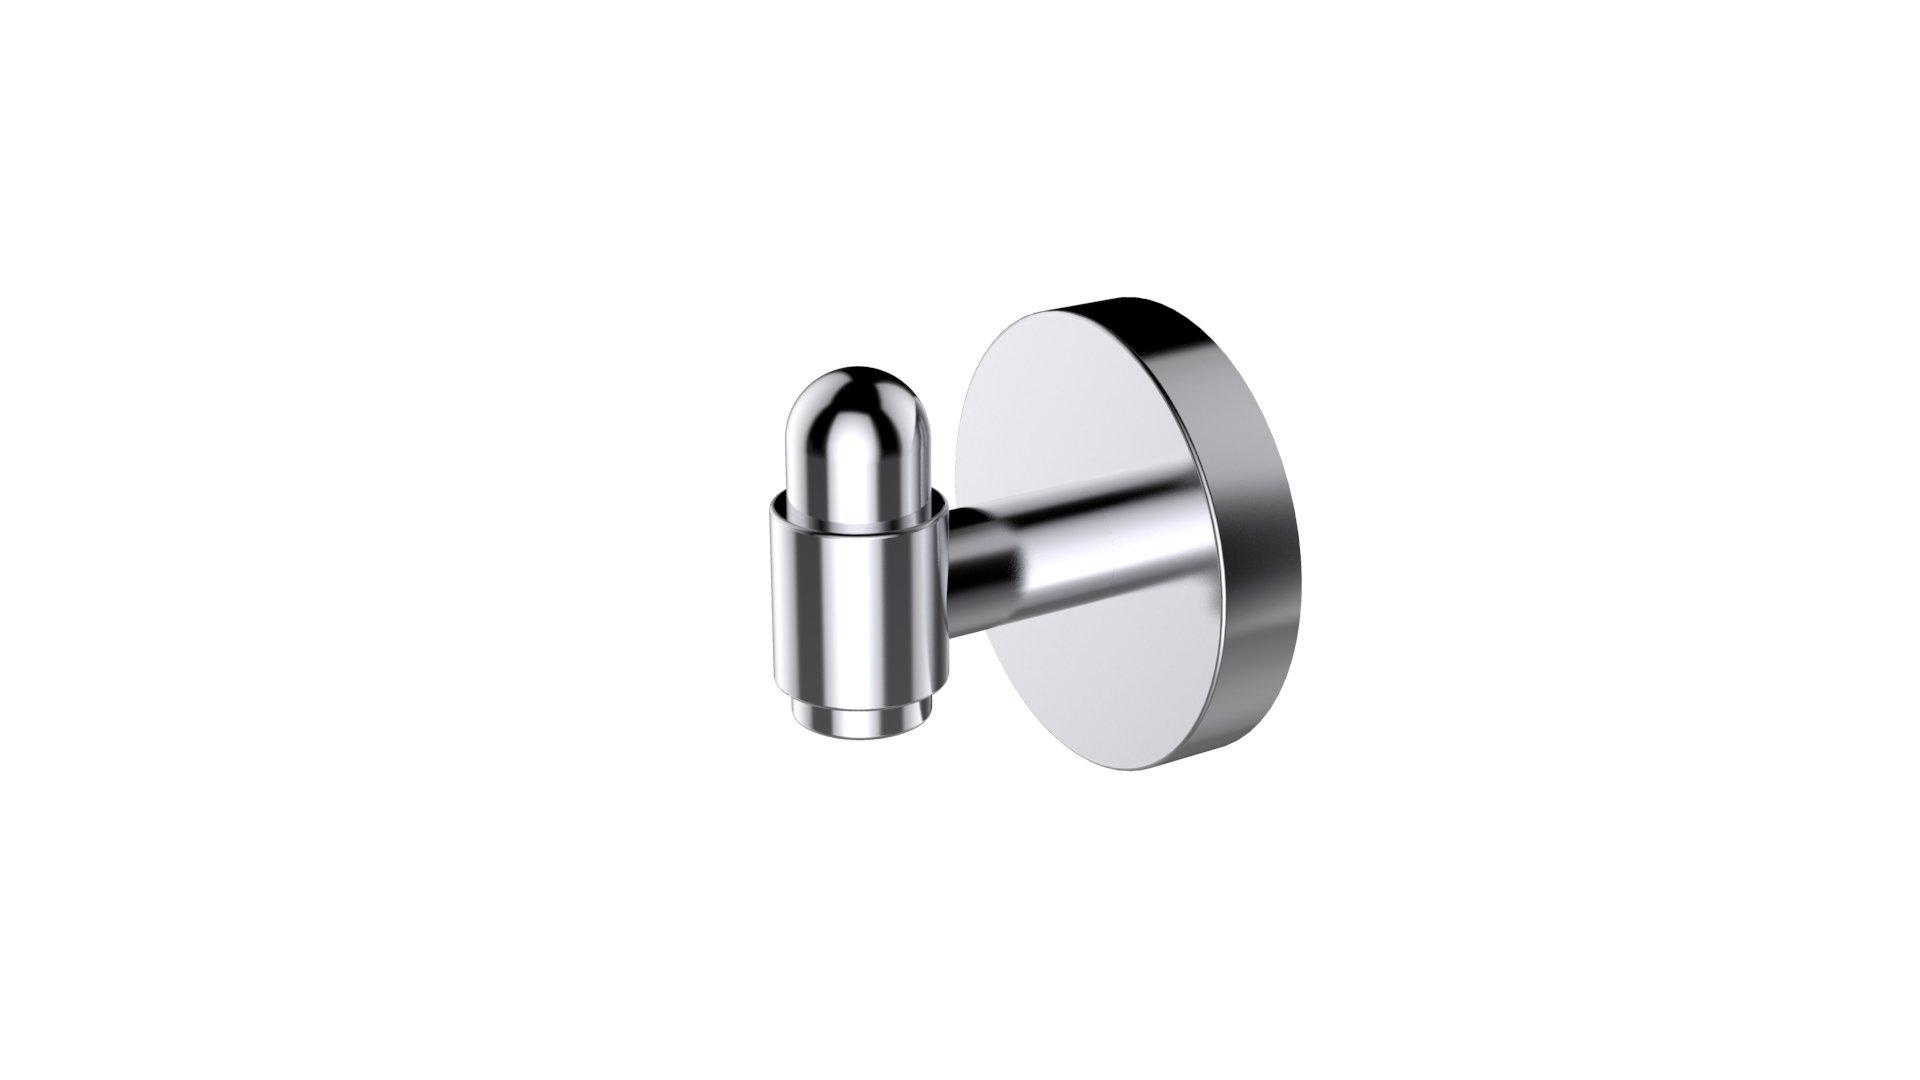 Eviva EVAC30BN Bullet Towel or Robe Hook ROUND Design Bathroom Accessories Combination, Brushed Nickel